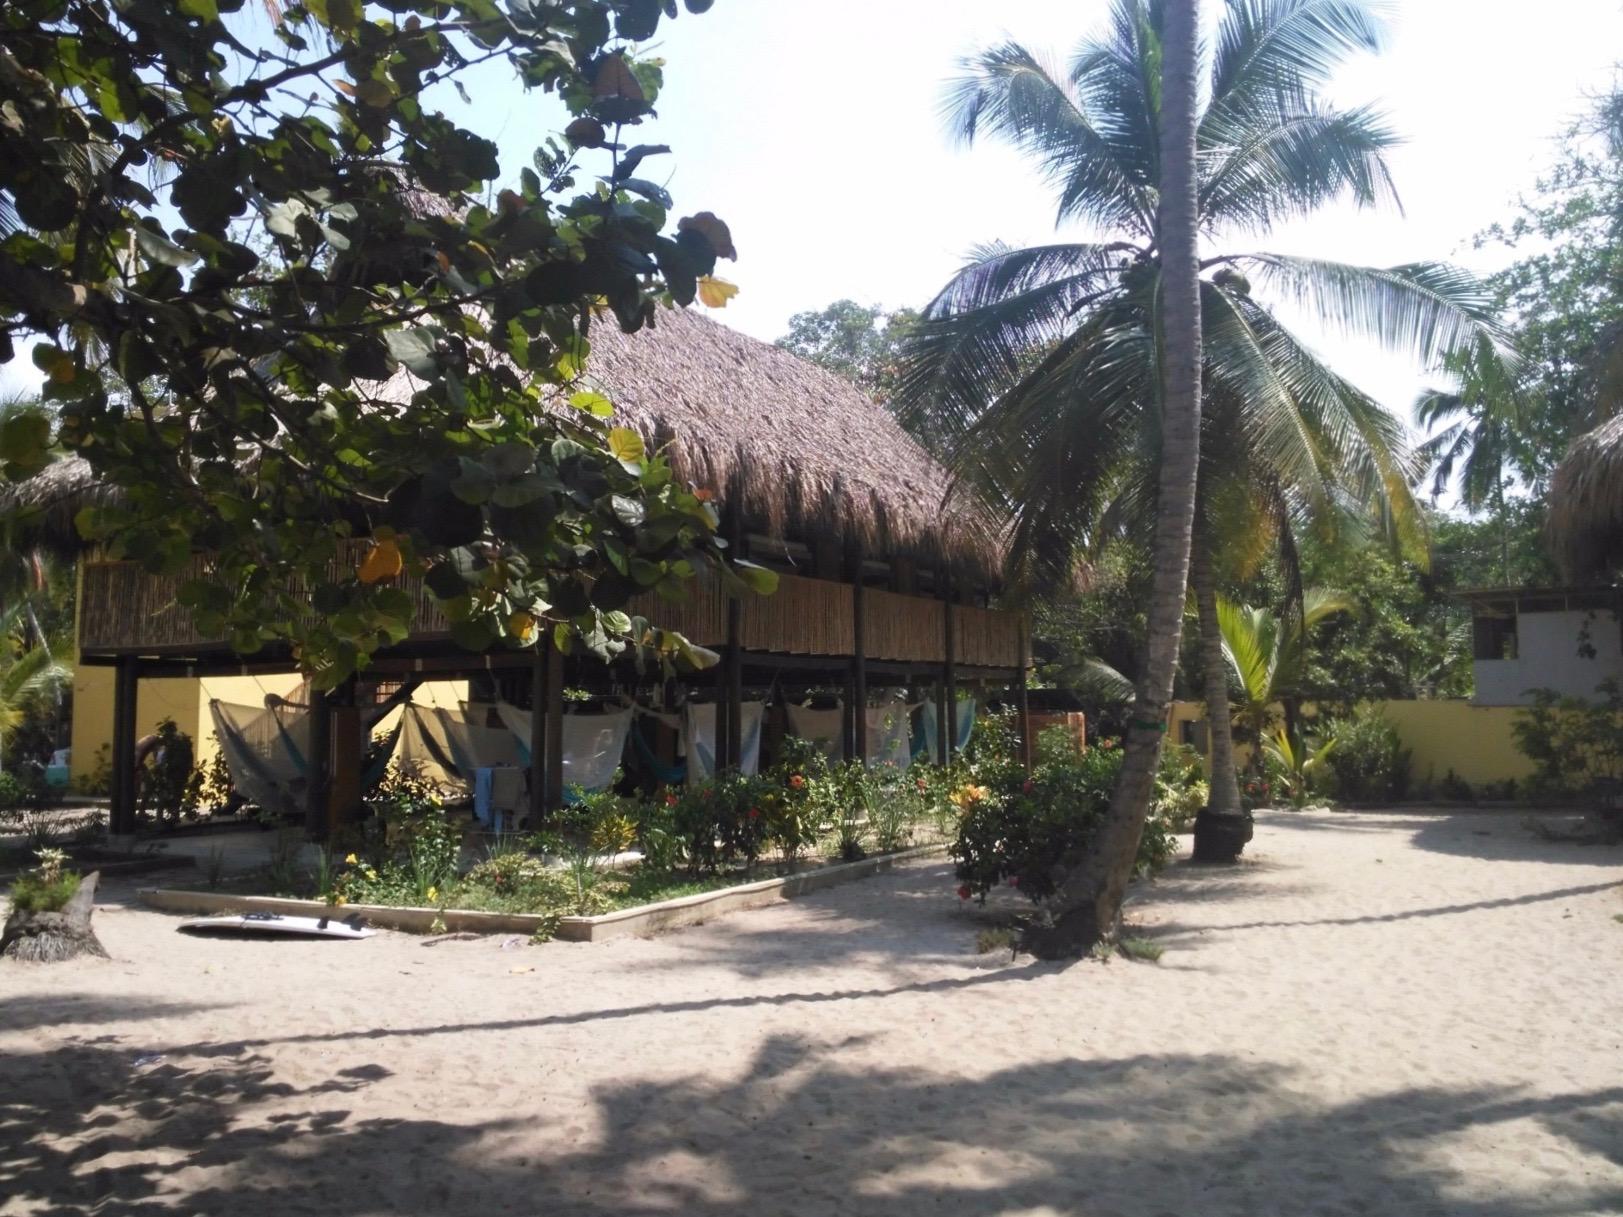 Lustrumreis Colombia - Costeno Beach Surf - 2